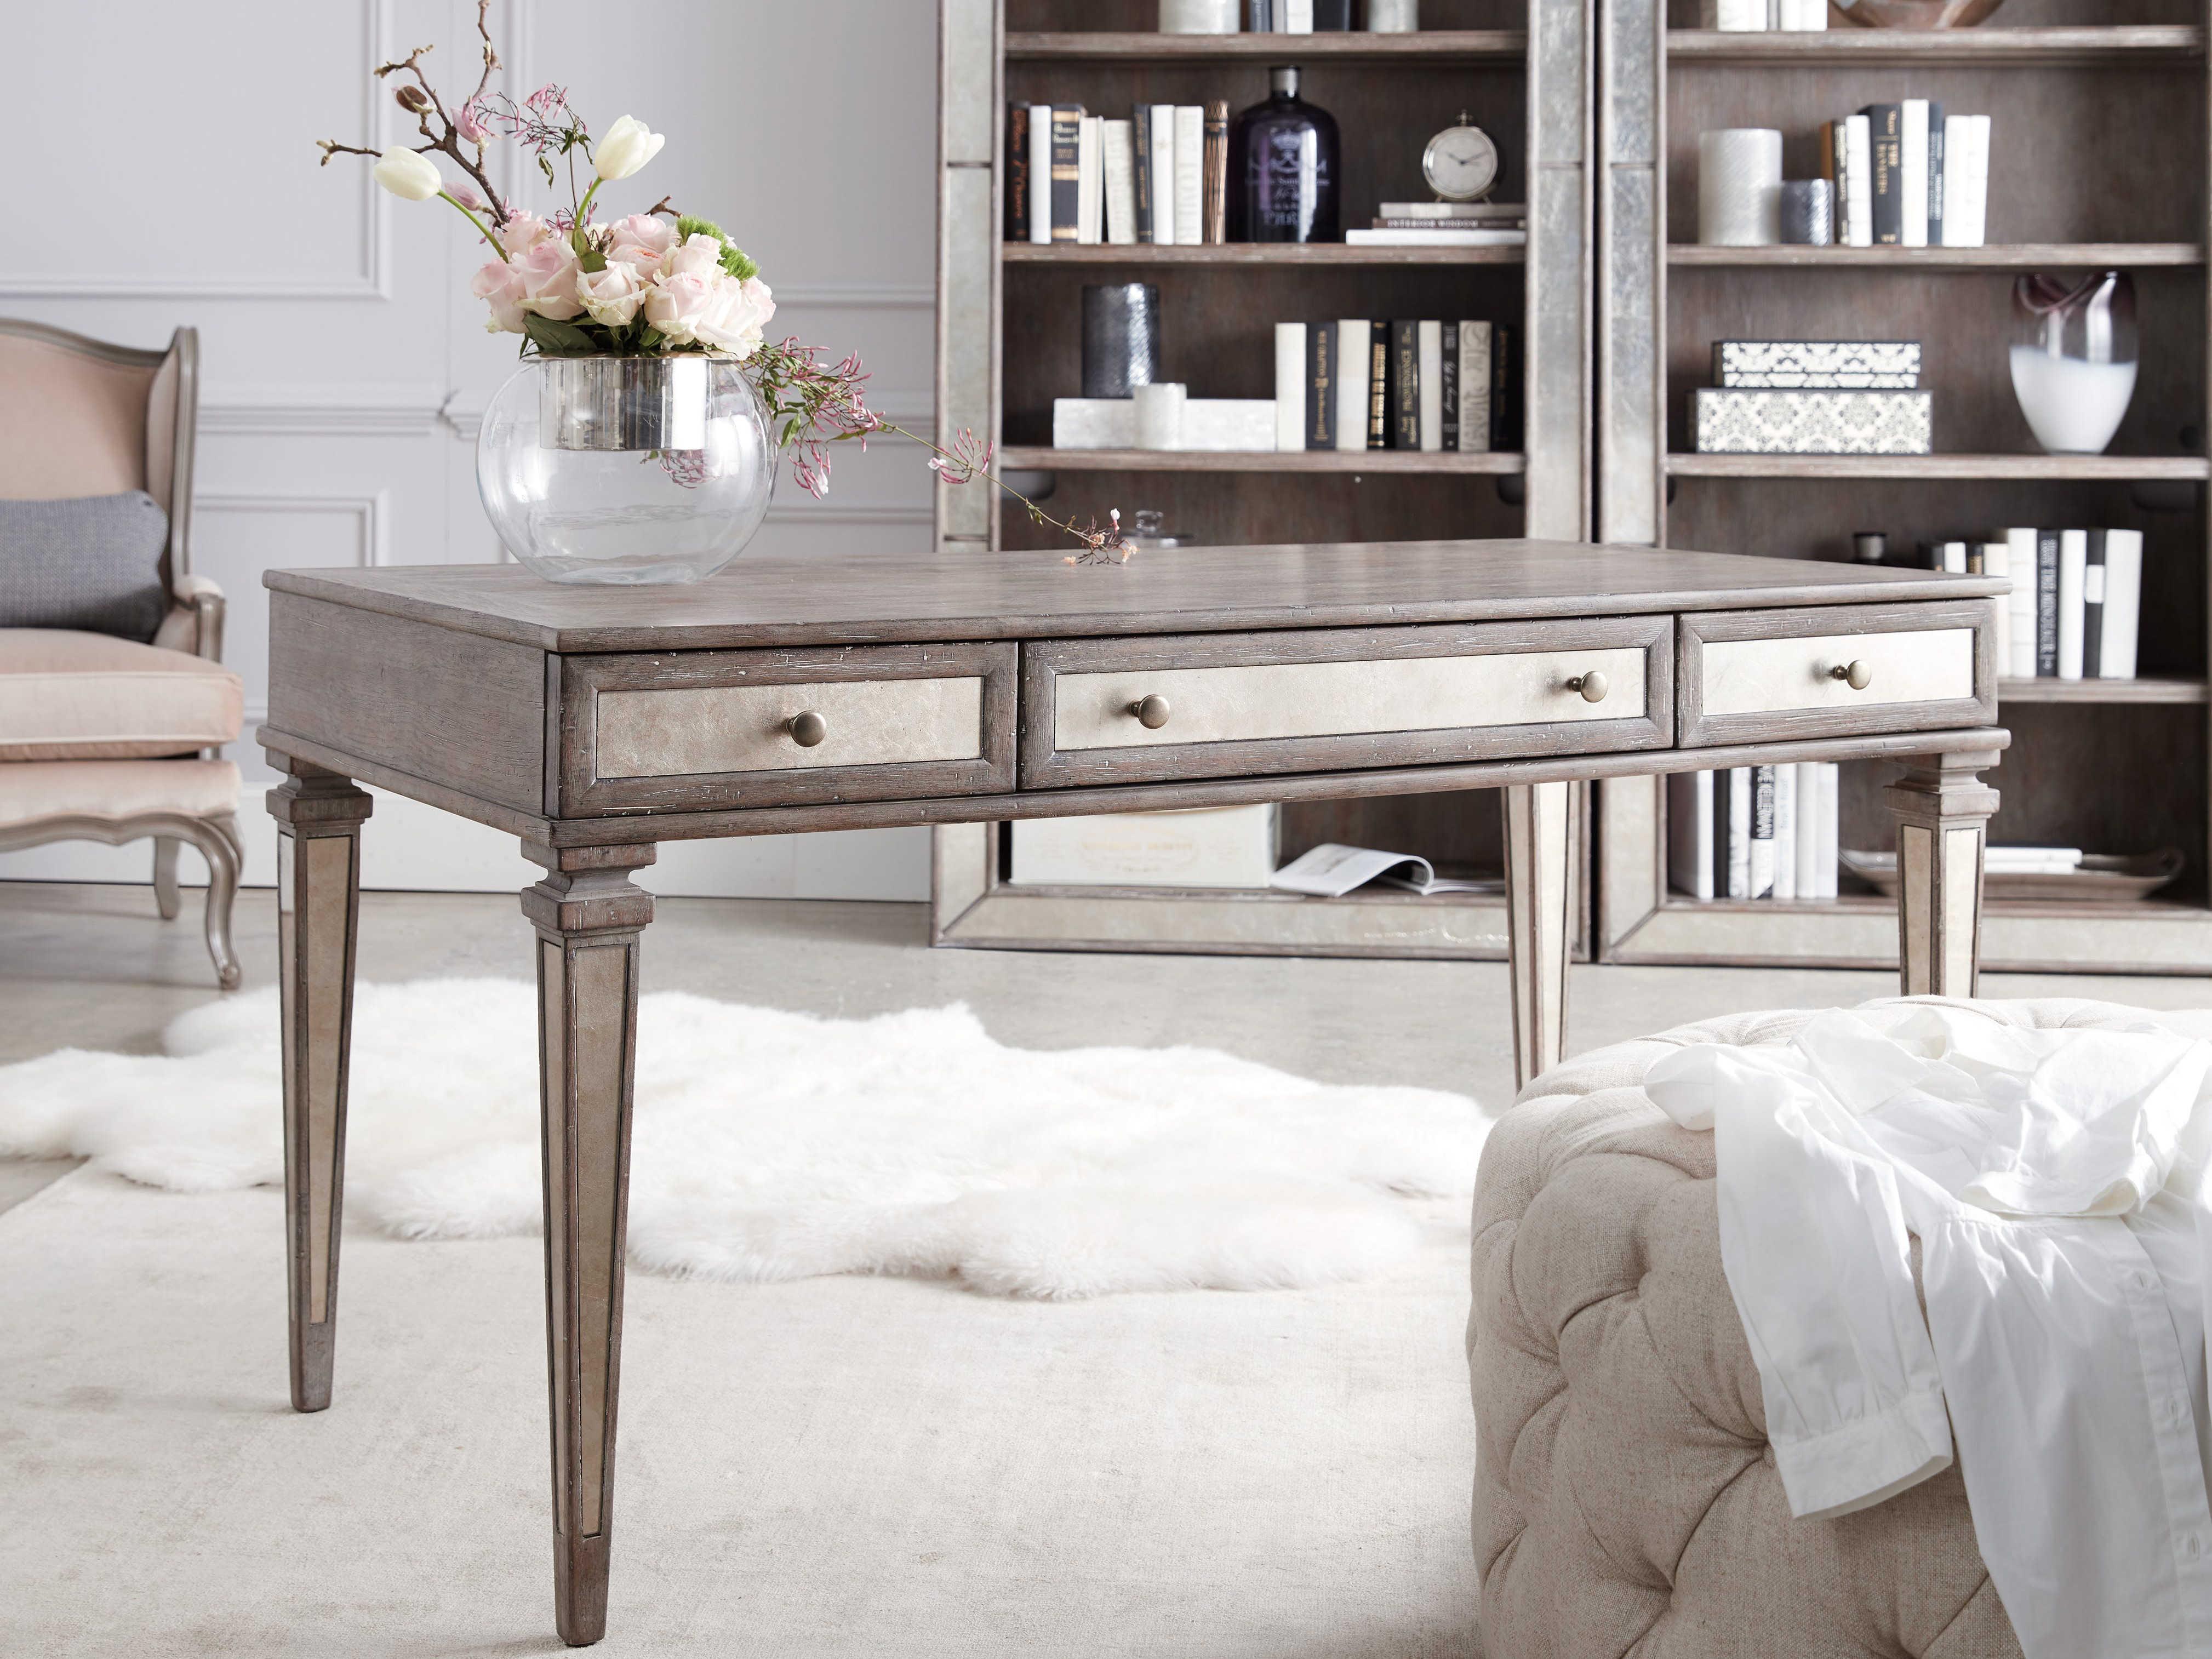 Furniture Rustic Glam Light Wood 54 L X 29 W Rectangular Writing Desk